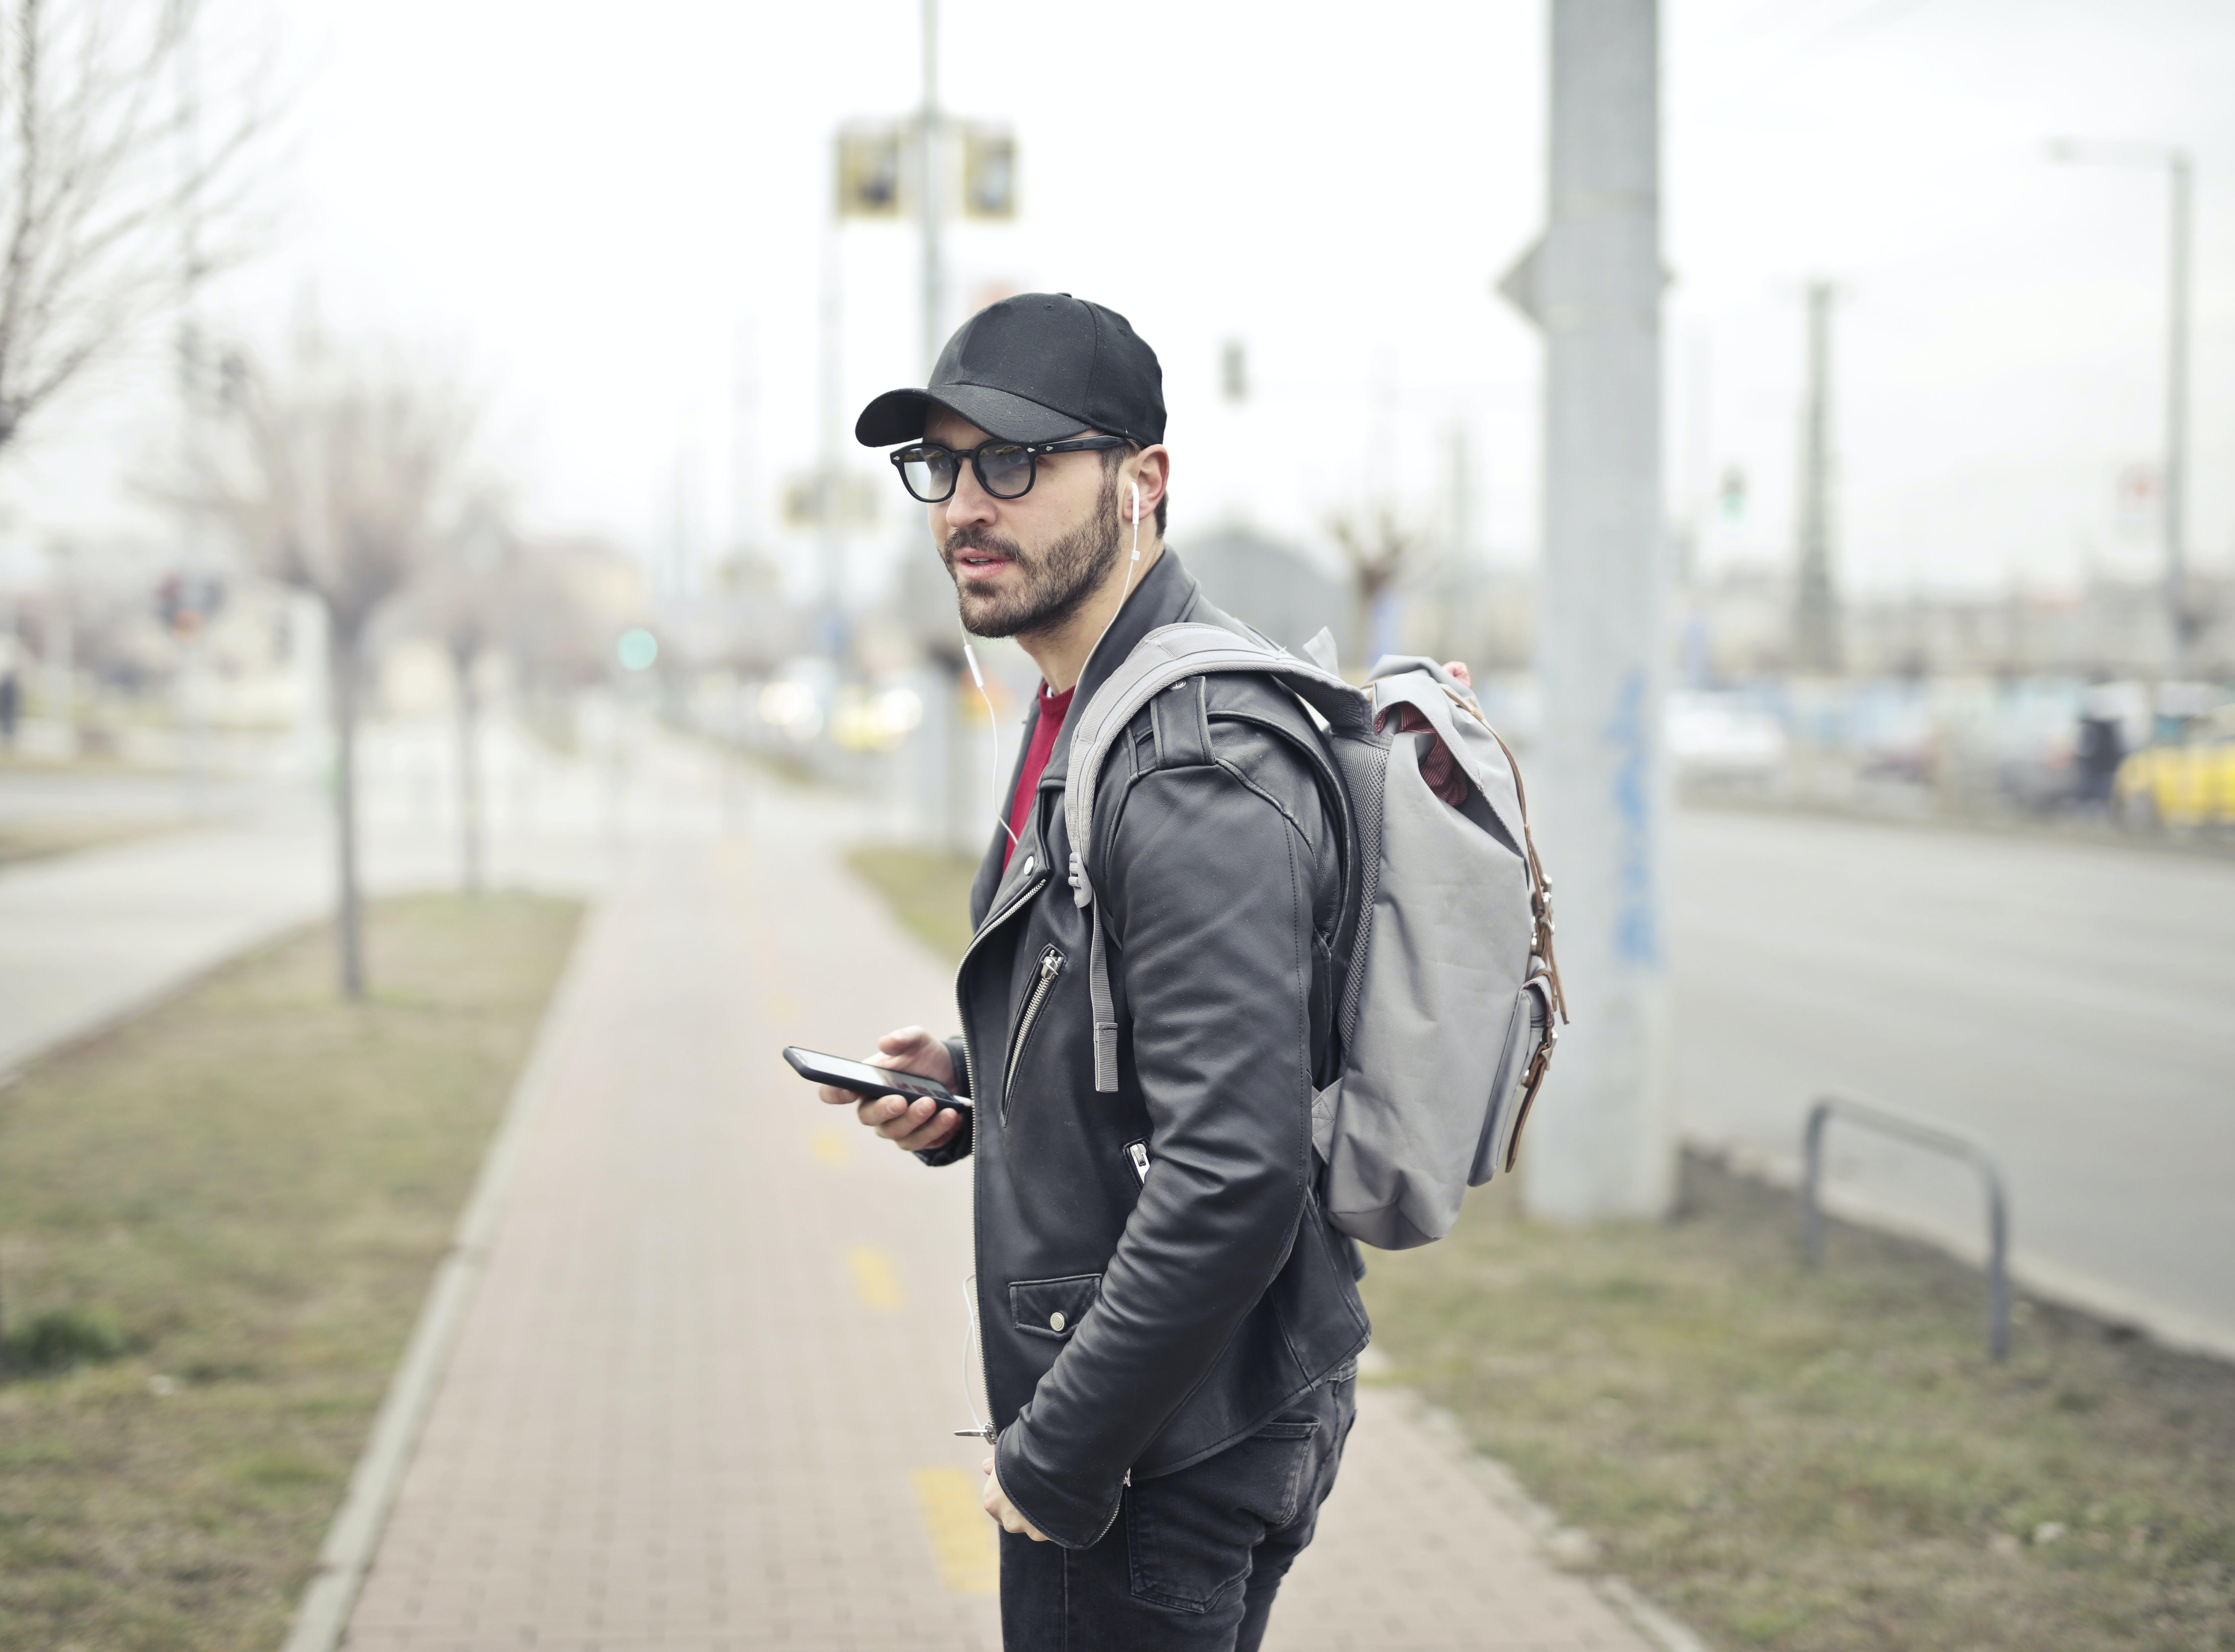 Man Wearing Black Leather Jacket Holding Smartphone